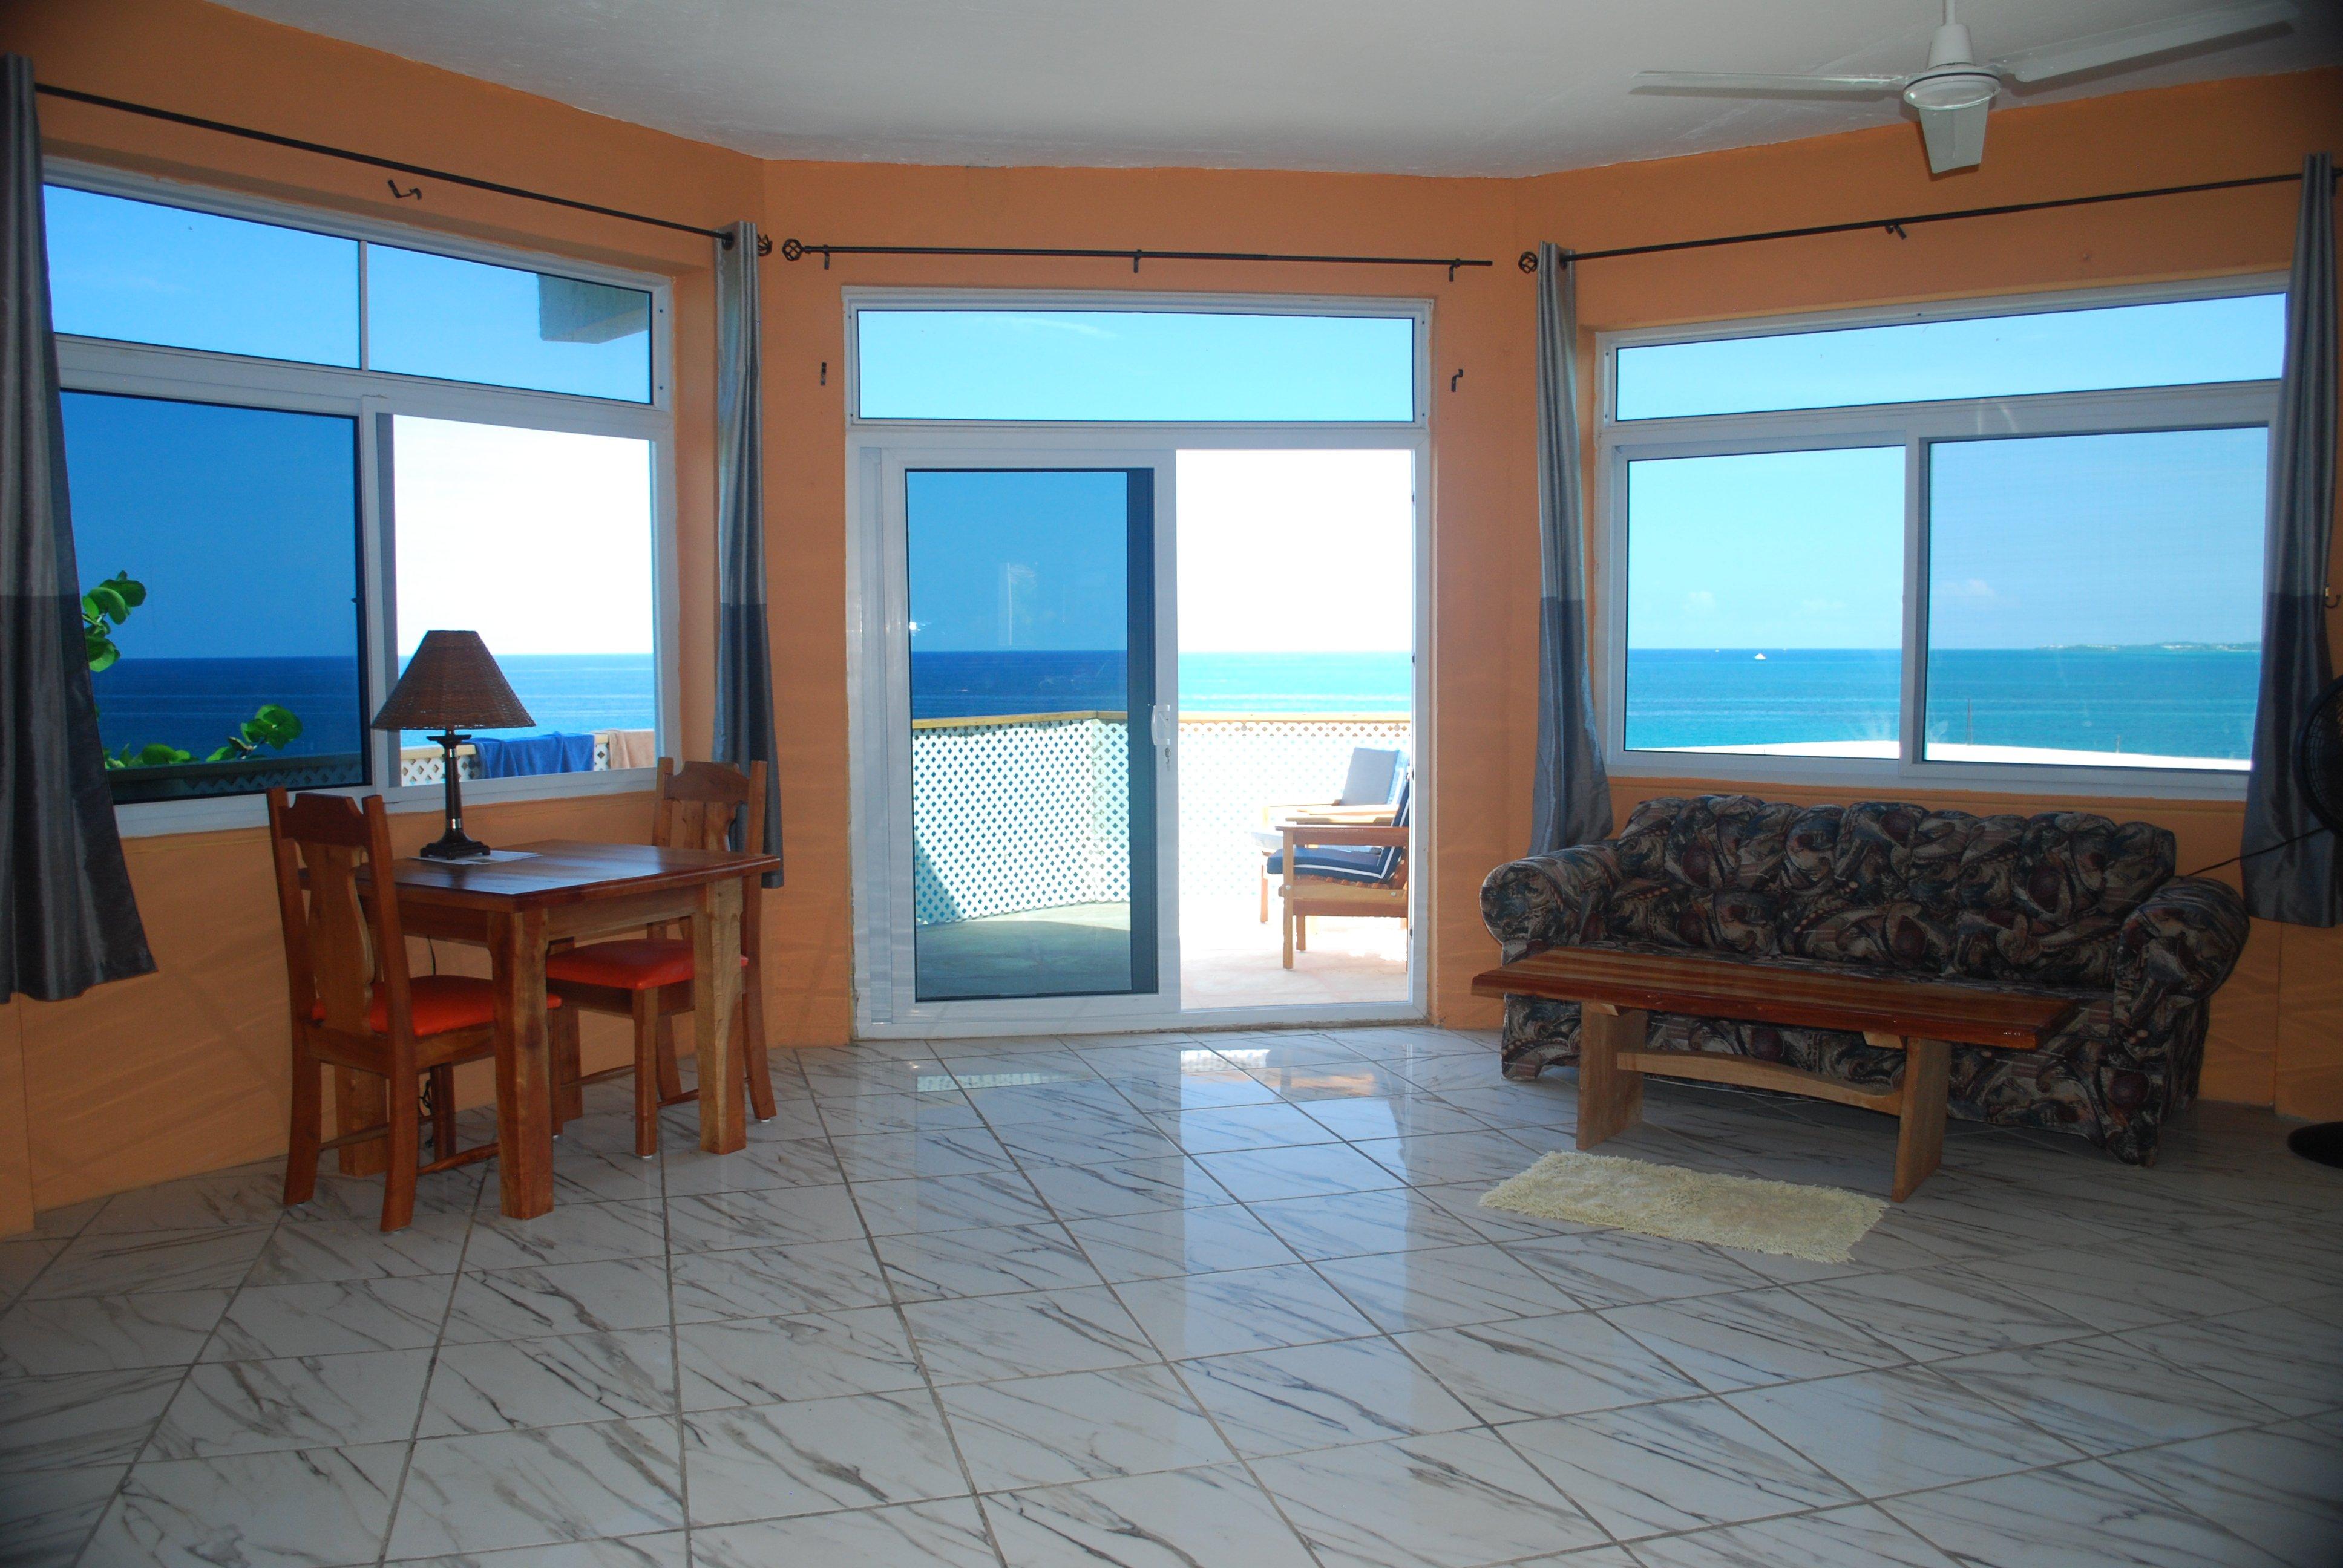 Home Sweet Home Room 17 Image 2